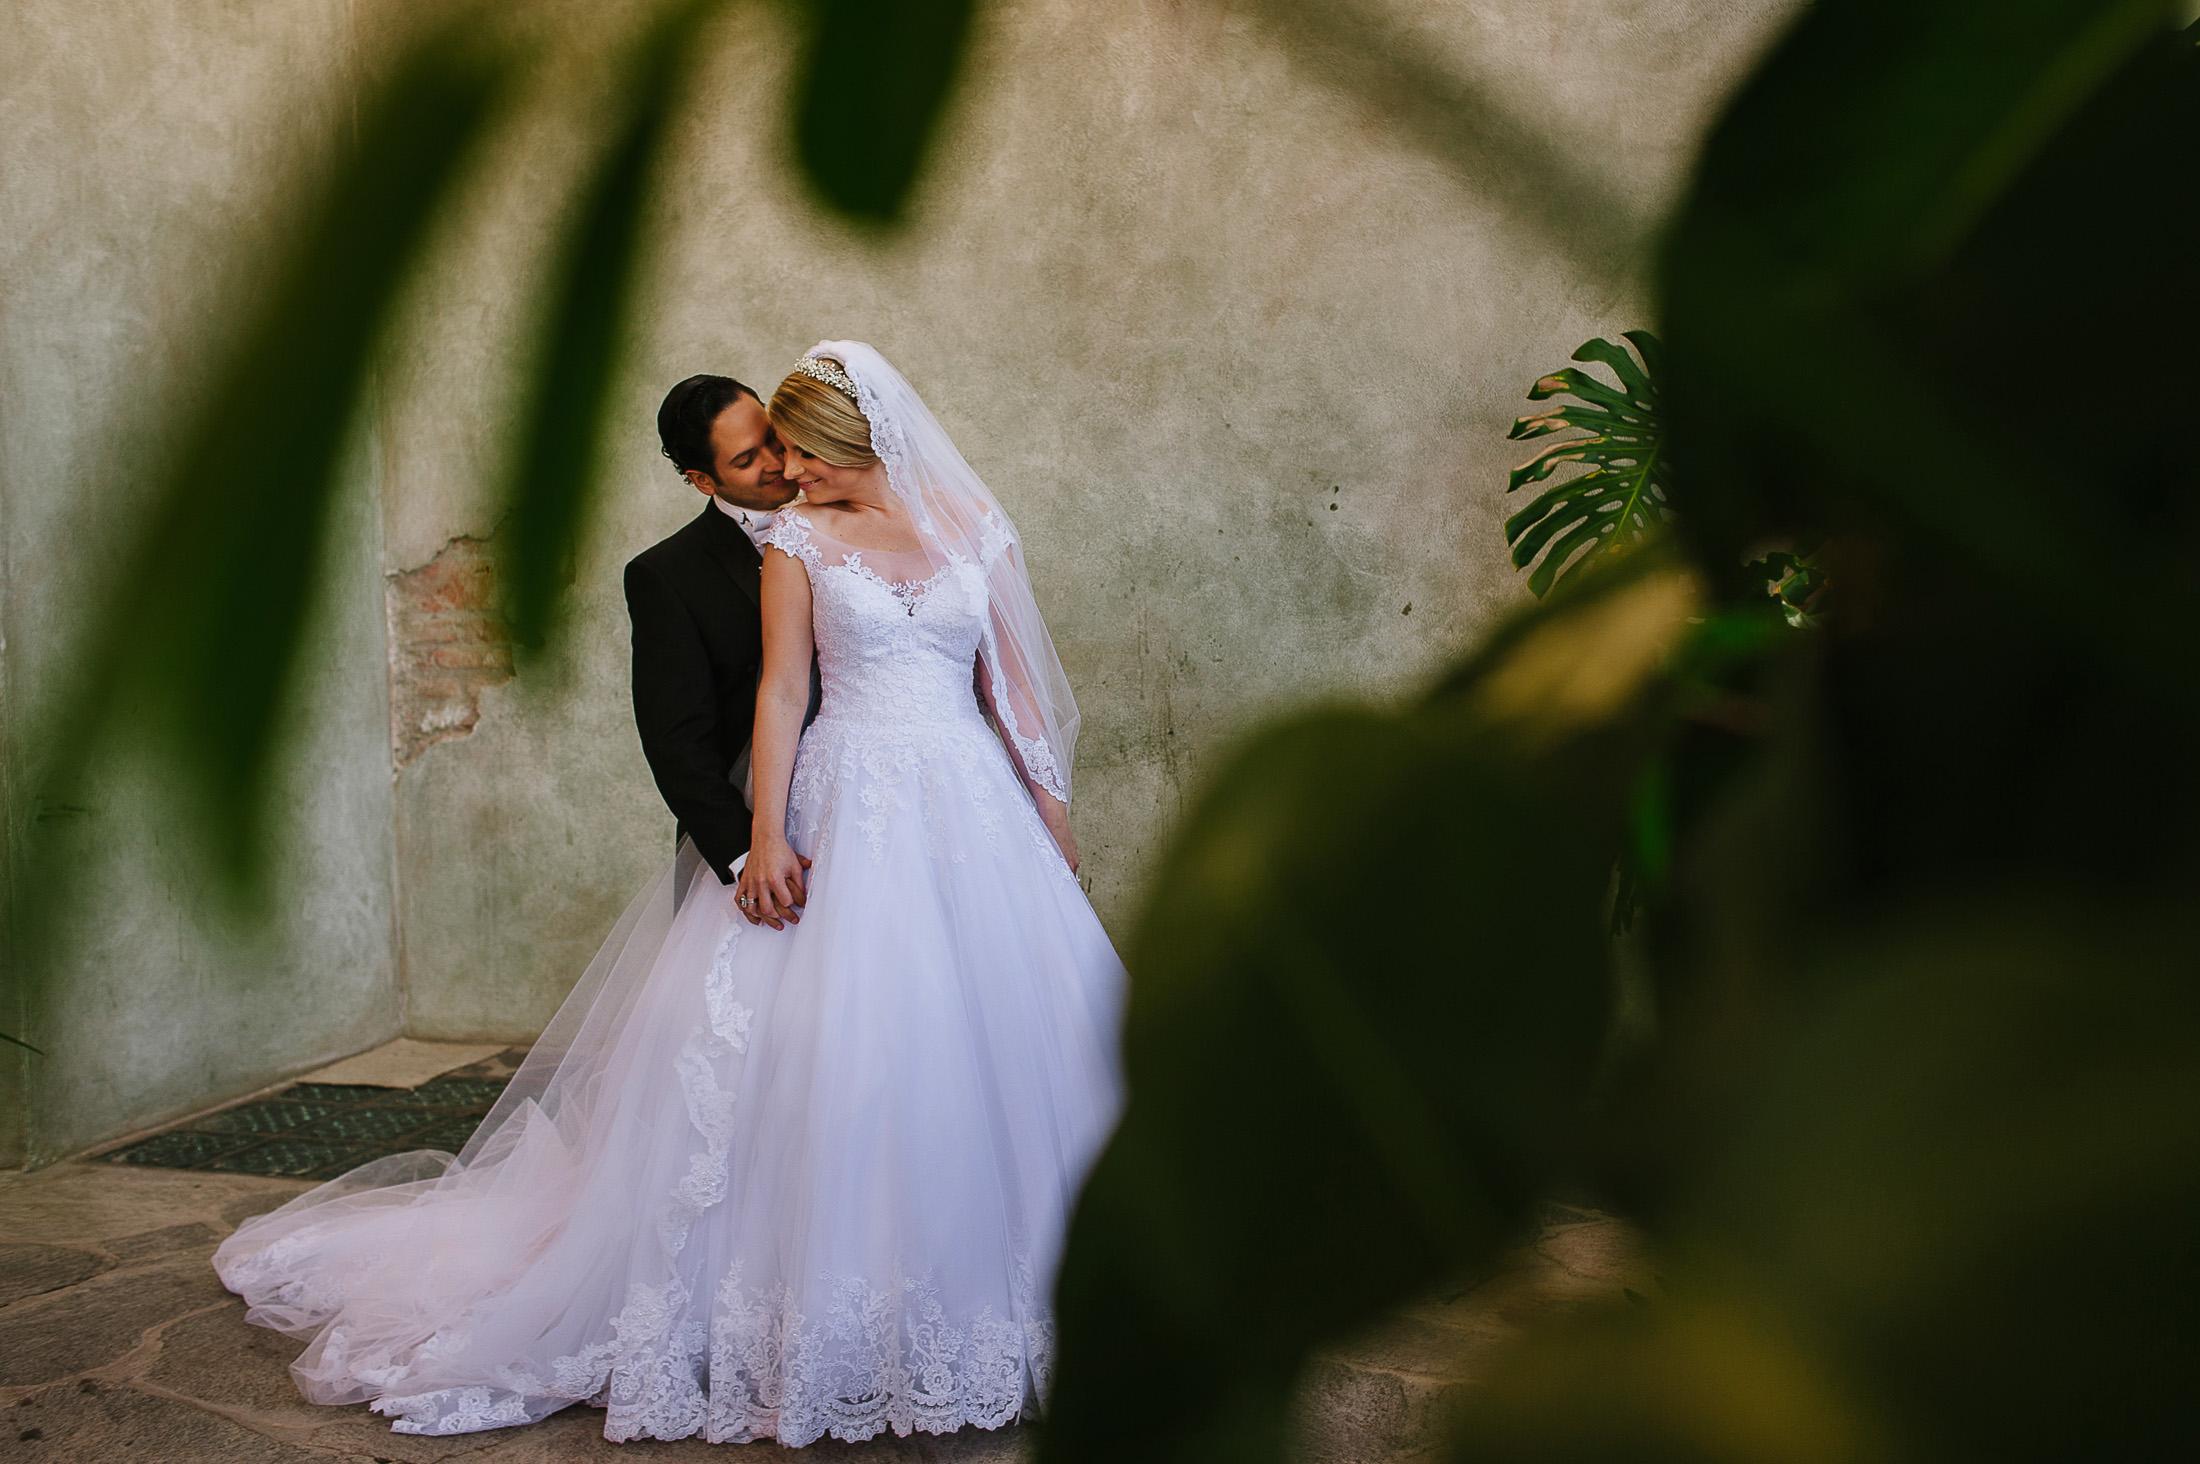 Bride and groom portraits in Instituro Allende